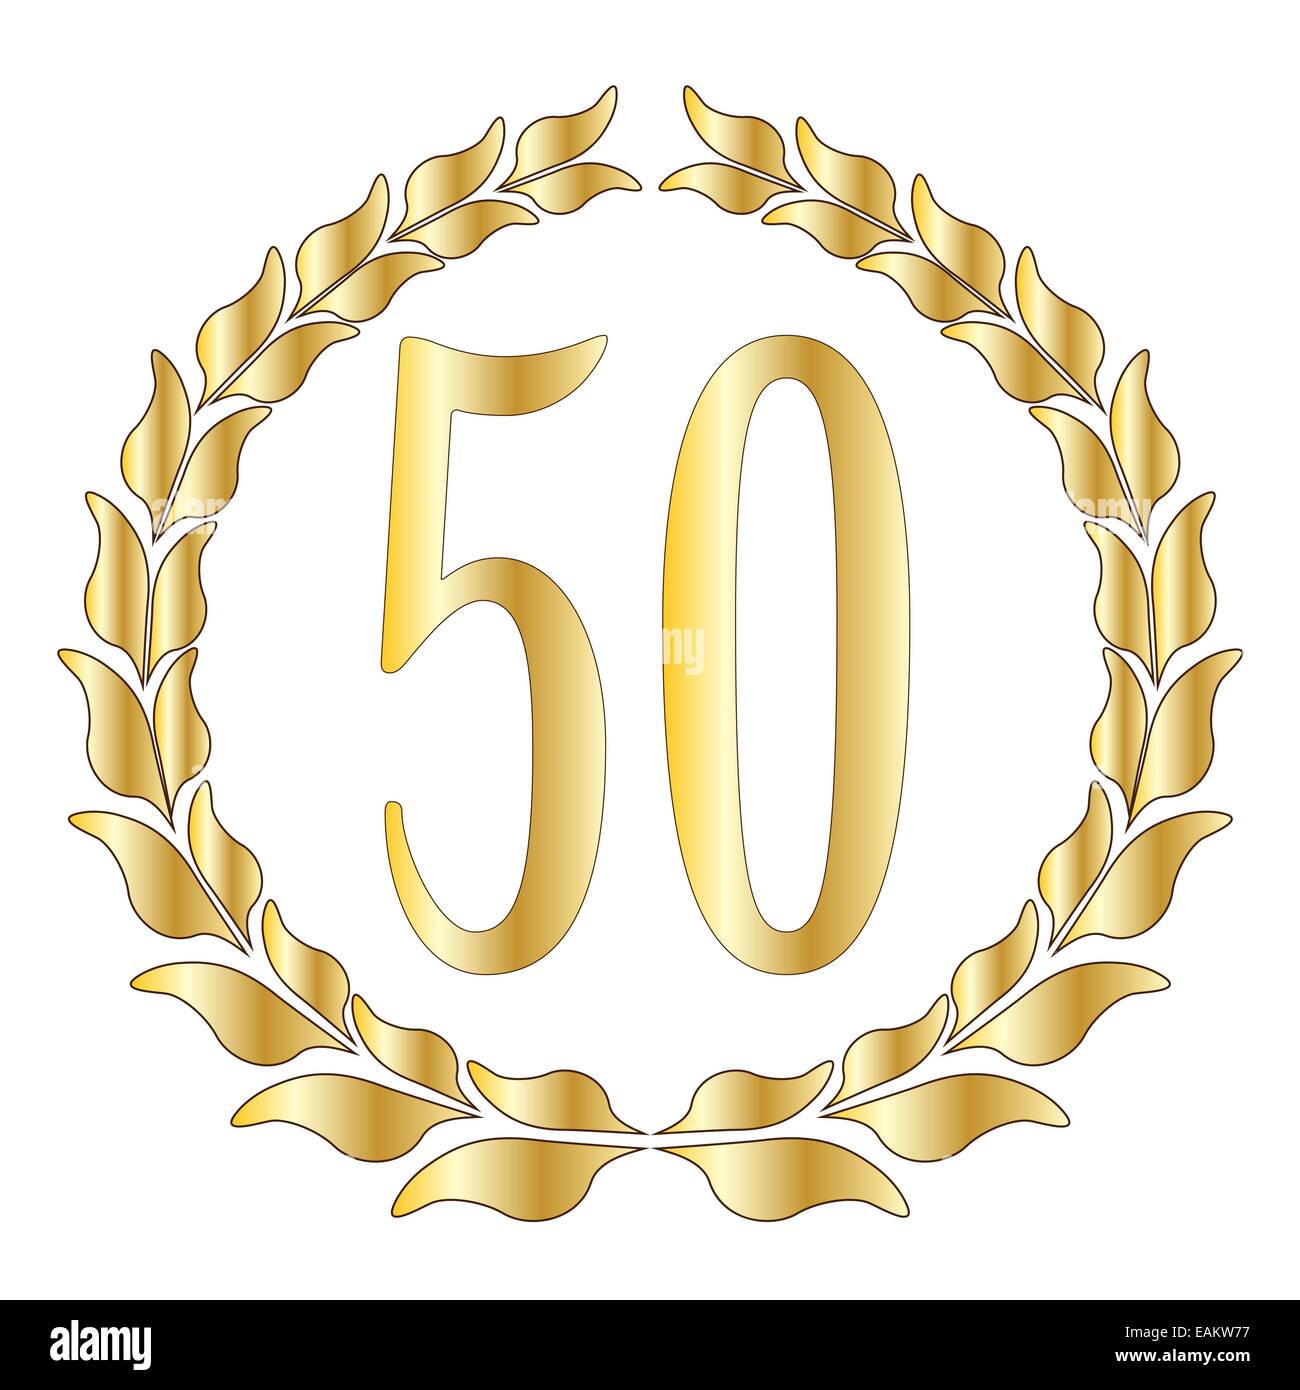 50th Wedding Anniversary Stock Photos 50th Wedding Anniversary